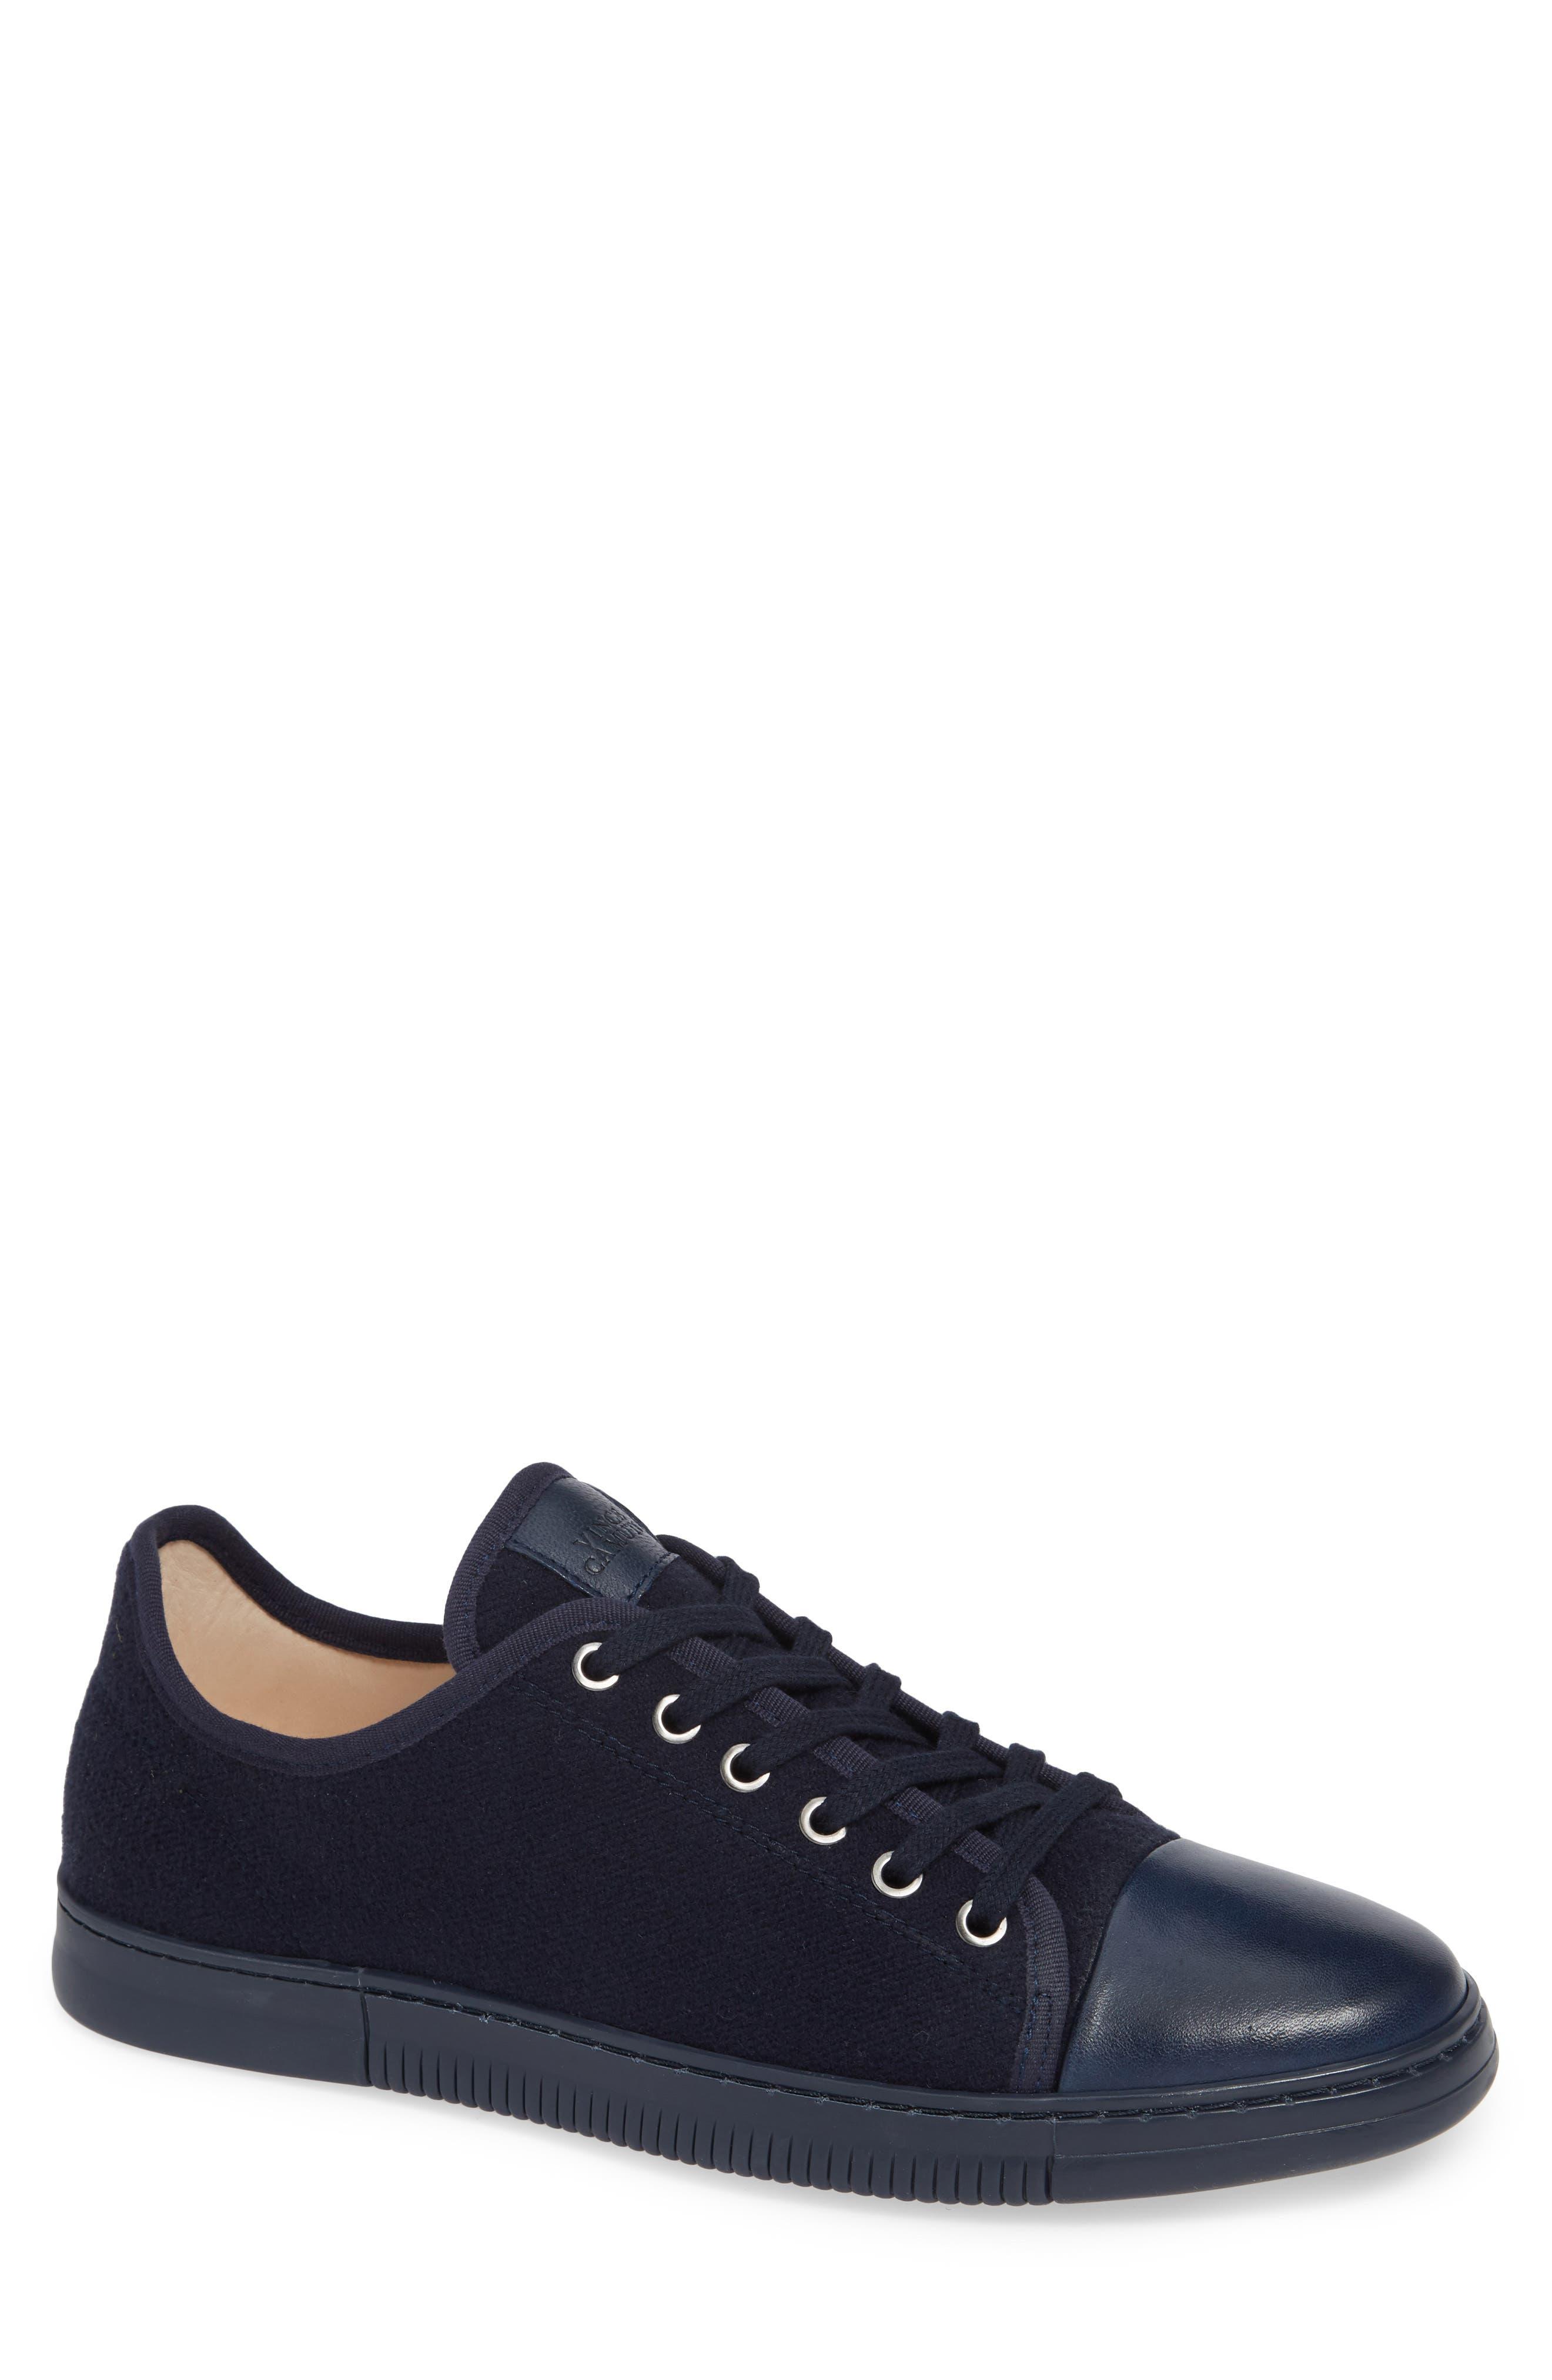 Jovani Sneaker,                             Main thumbnail 1, color,                             BLUE FABRIC